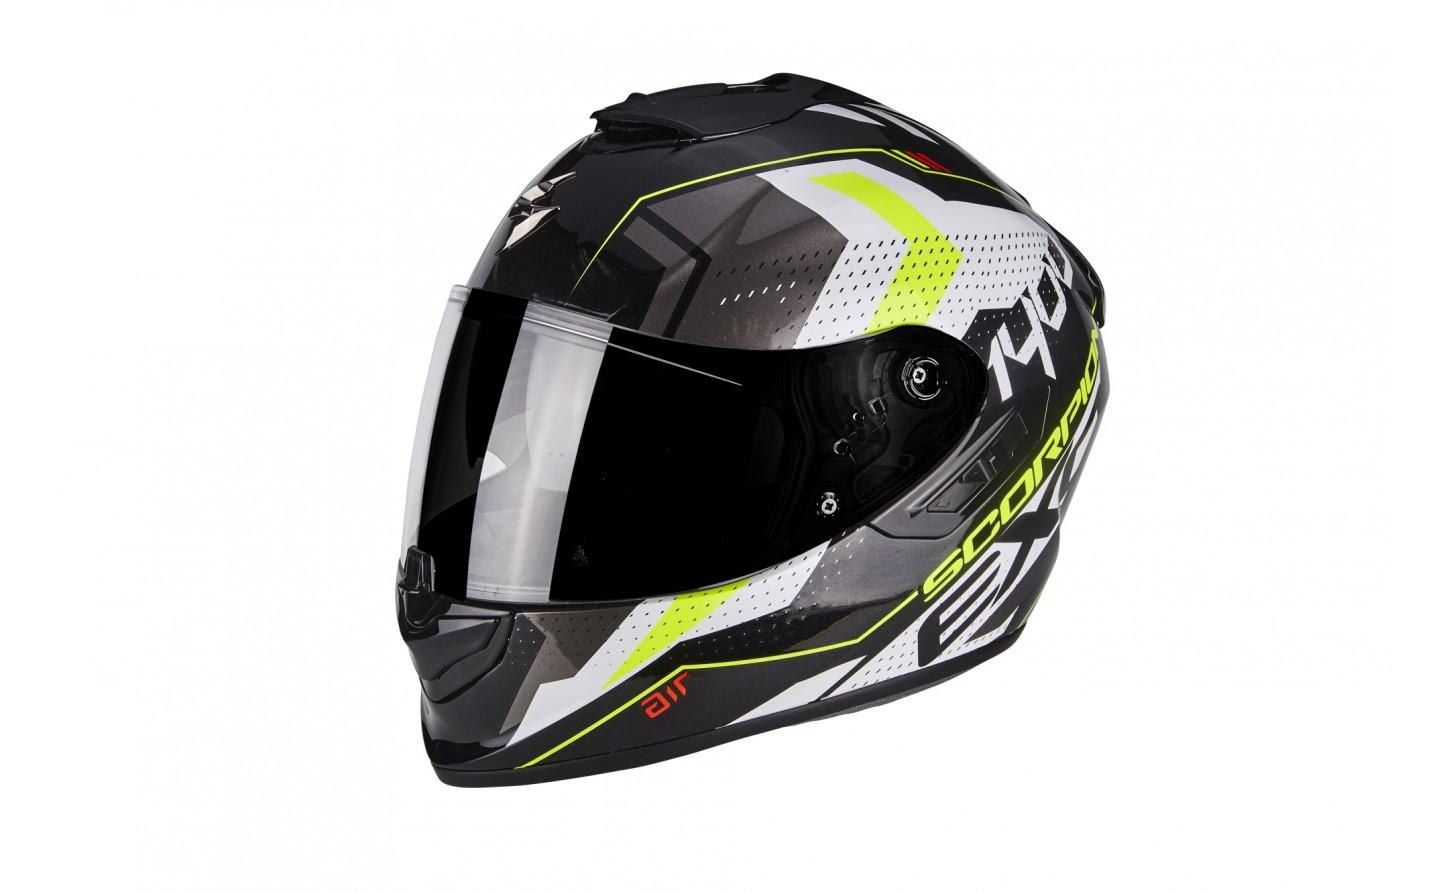 Scorpion exo-1400 air Trika MOTOCICLETA casco blanco-negro-amarillo flúor talla s